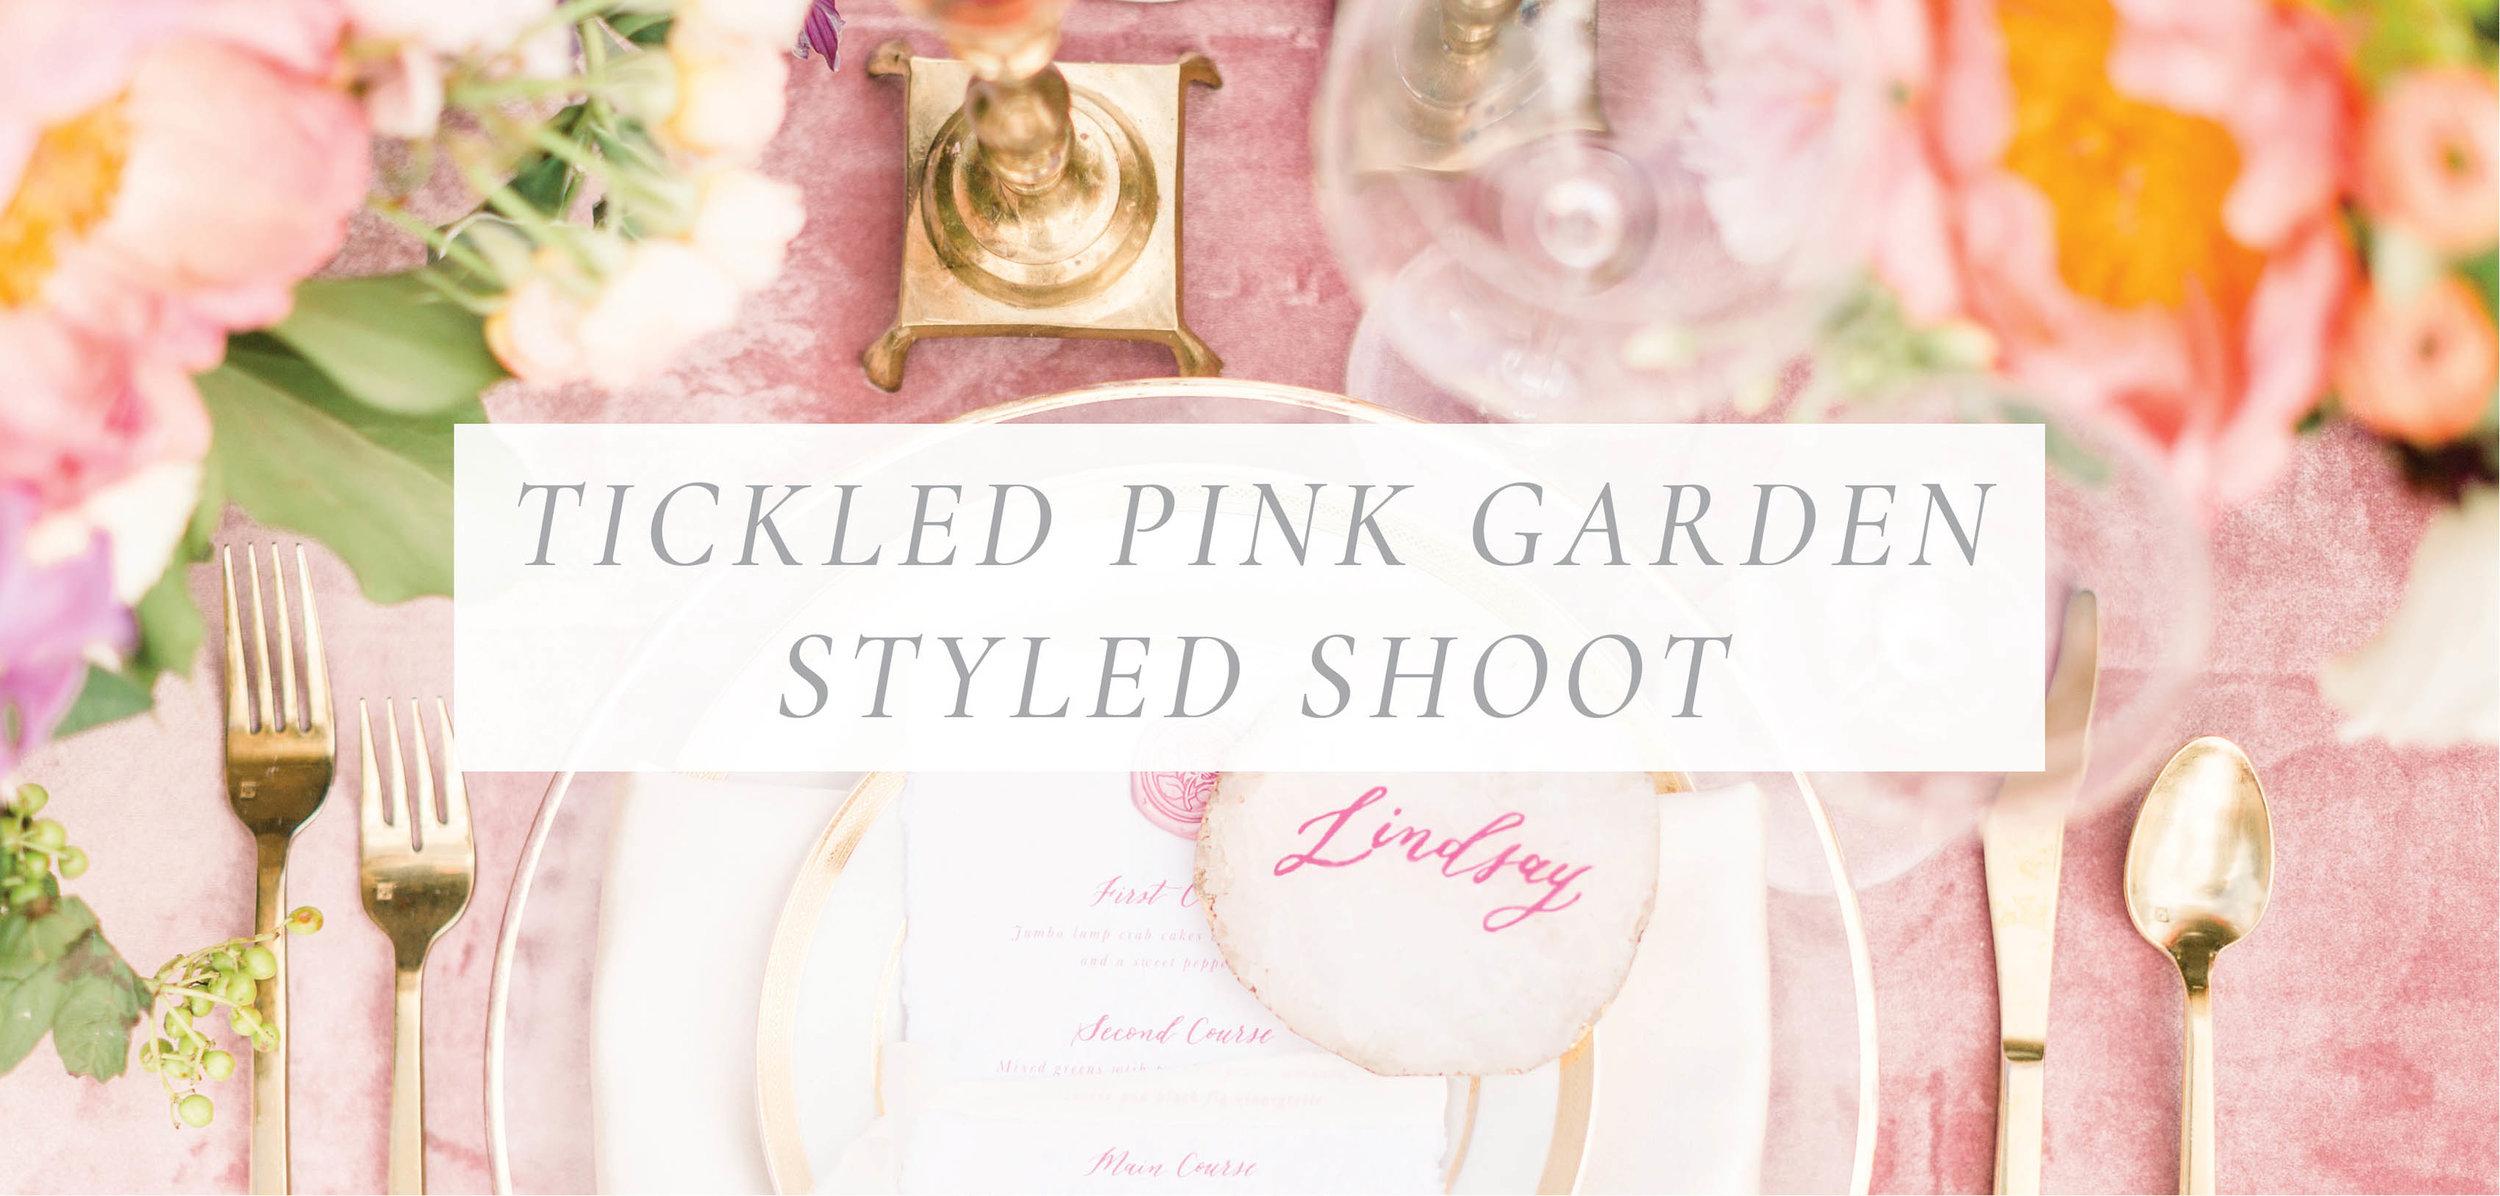 Tickled Pink Garden Styled Shoot.jpg